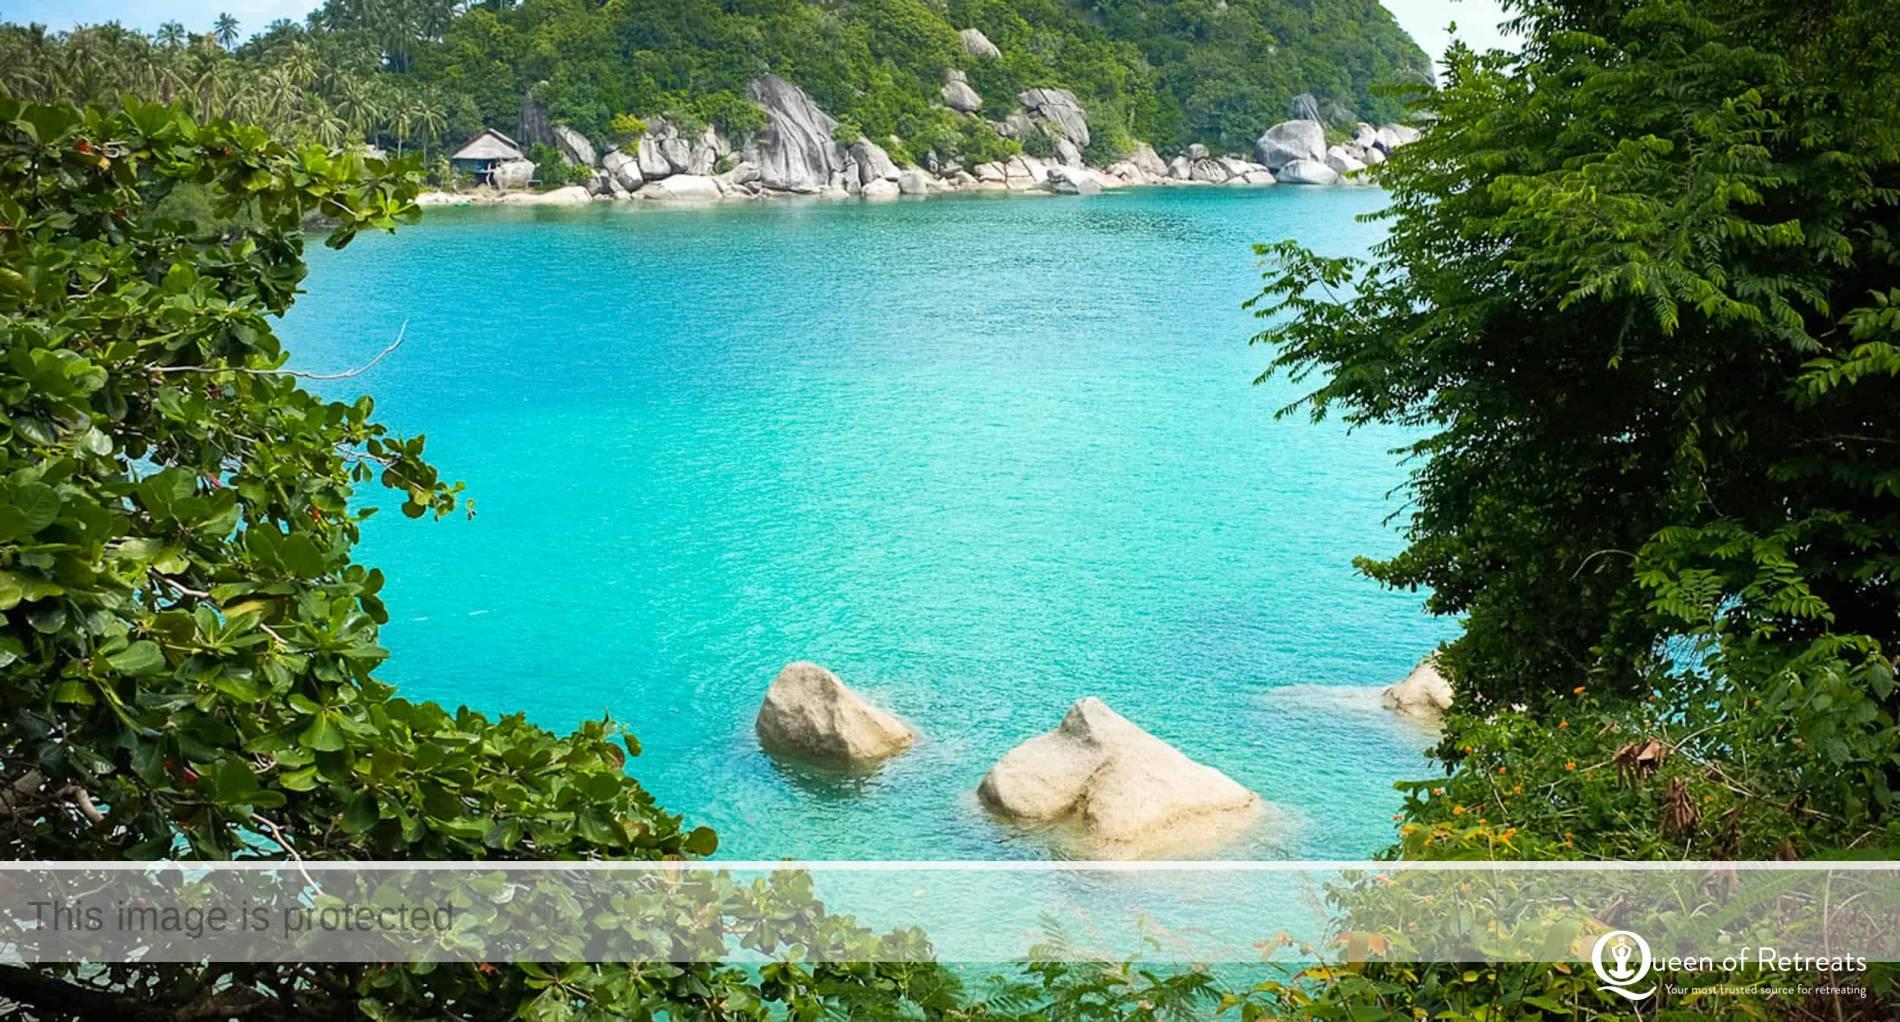 The Sanctuary Thailand Retreat